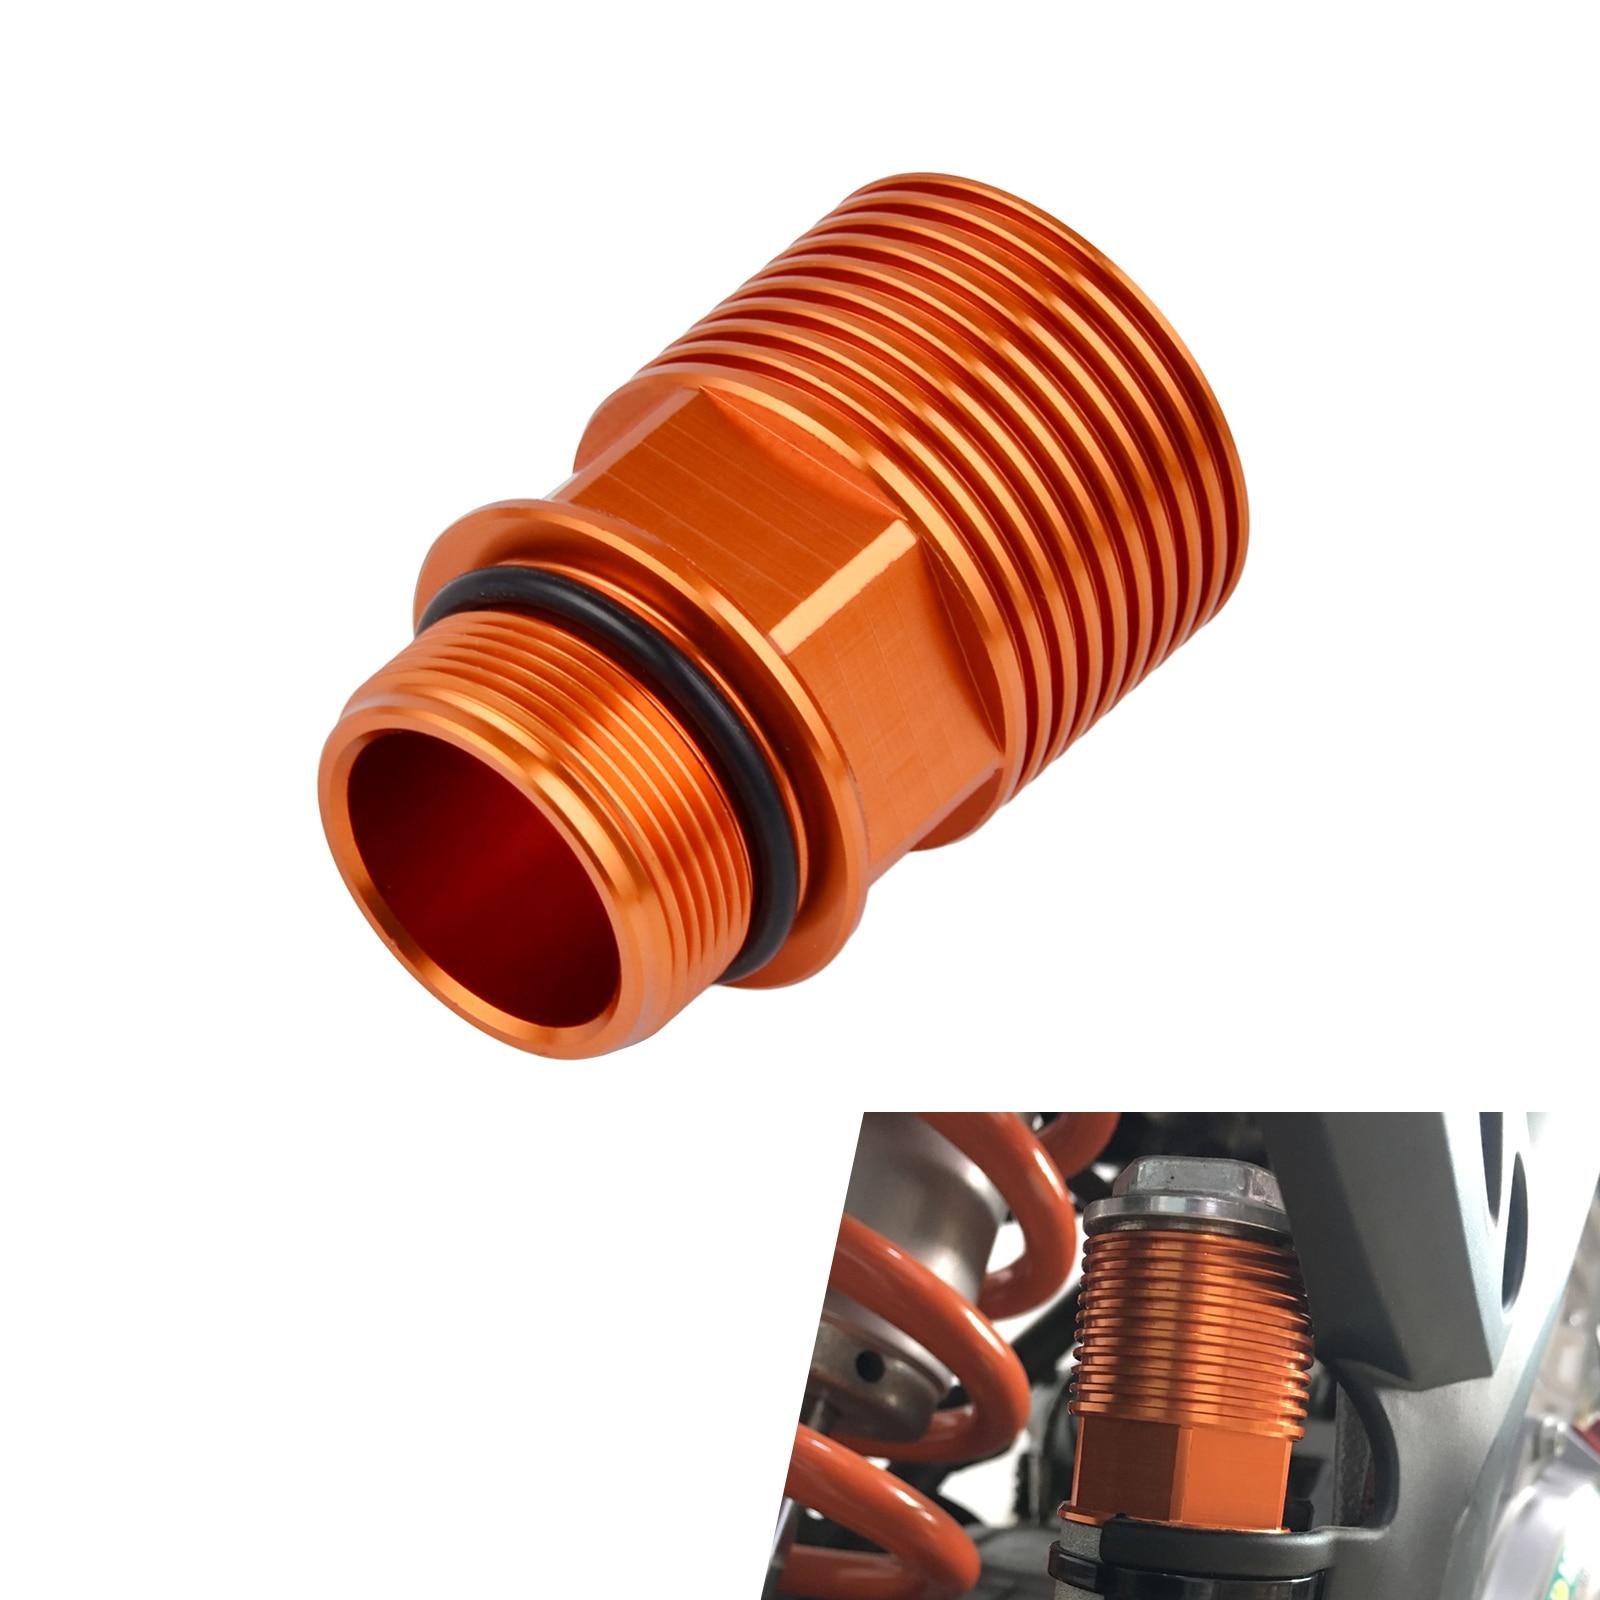 NICECNC CNC Rear Brake Reservoir Extender For KTM 125 144 150 200 250 350 400 450 500 525 530 SX SXF SX-F EXC EXC-F EXCF nicecnc cnc billet brake clutch